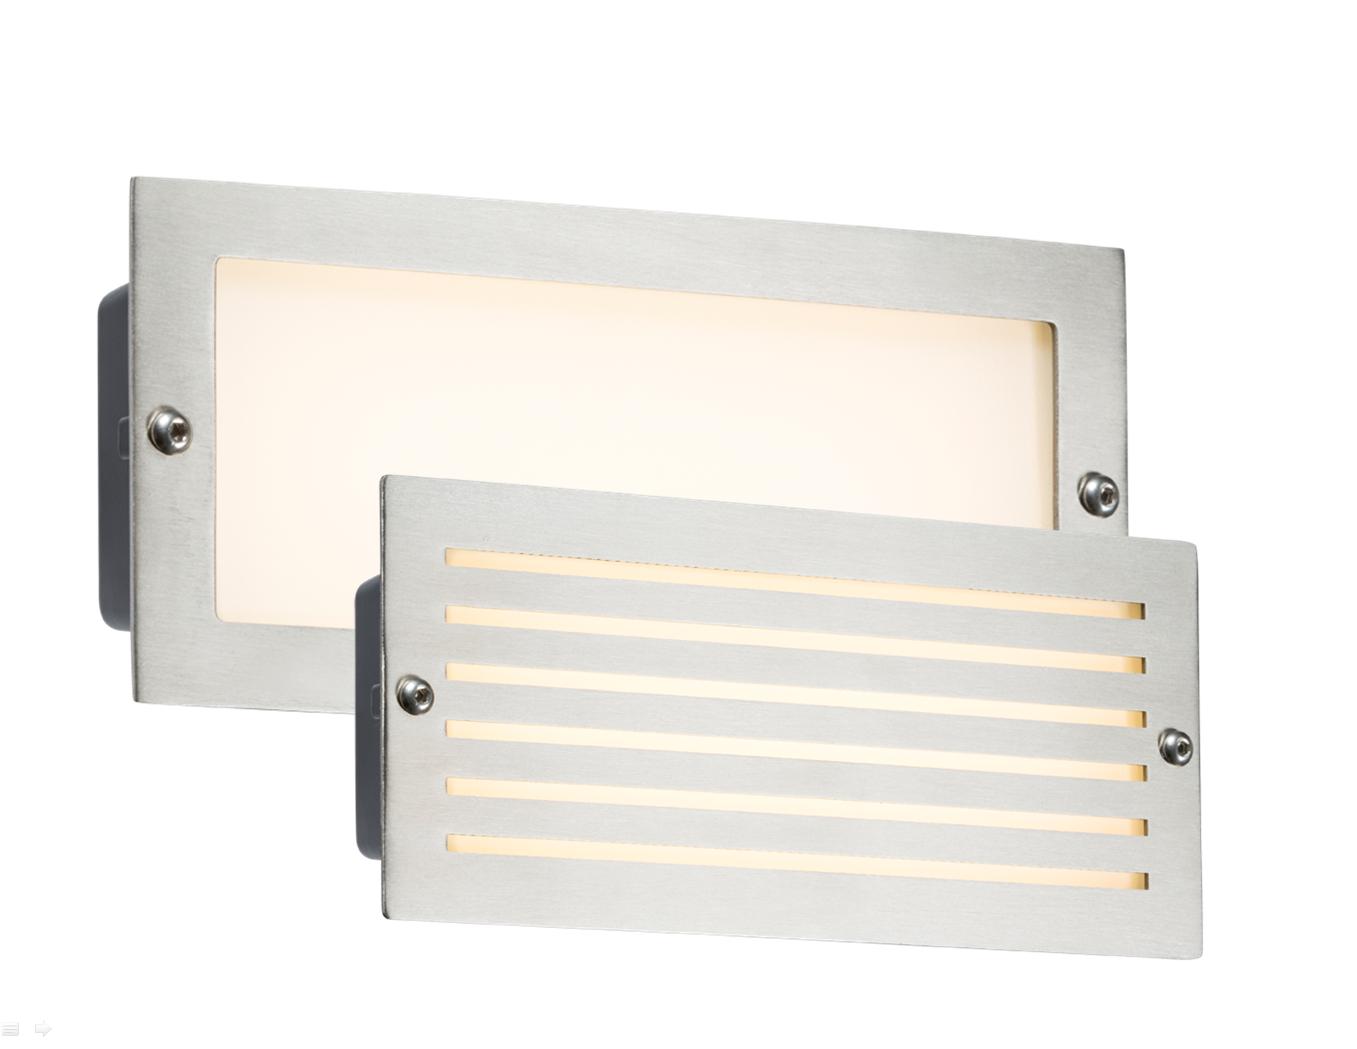 230V IP54 5W WHITE LED BRICK LIGHT - BRUSHED STEEL FASCIA